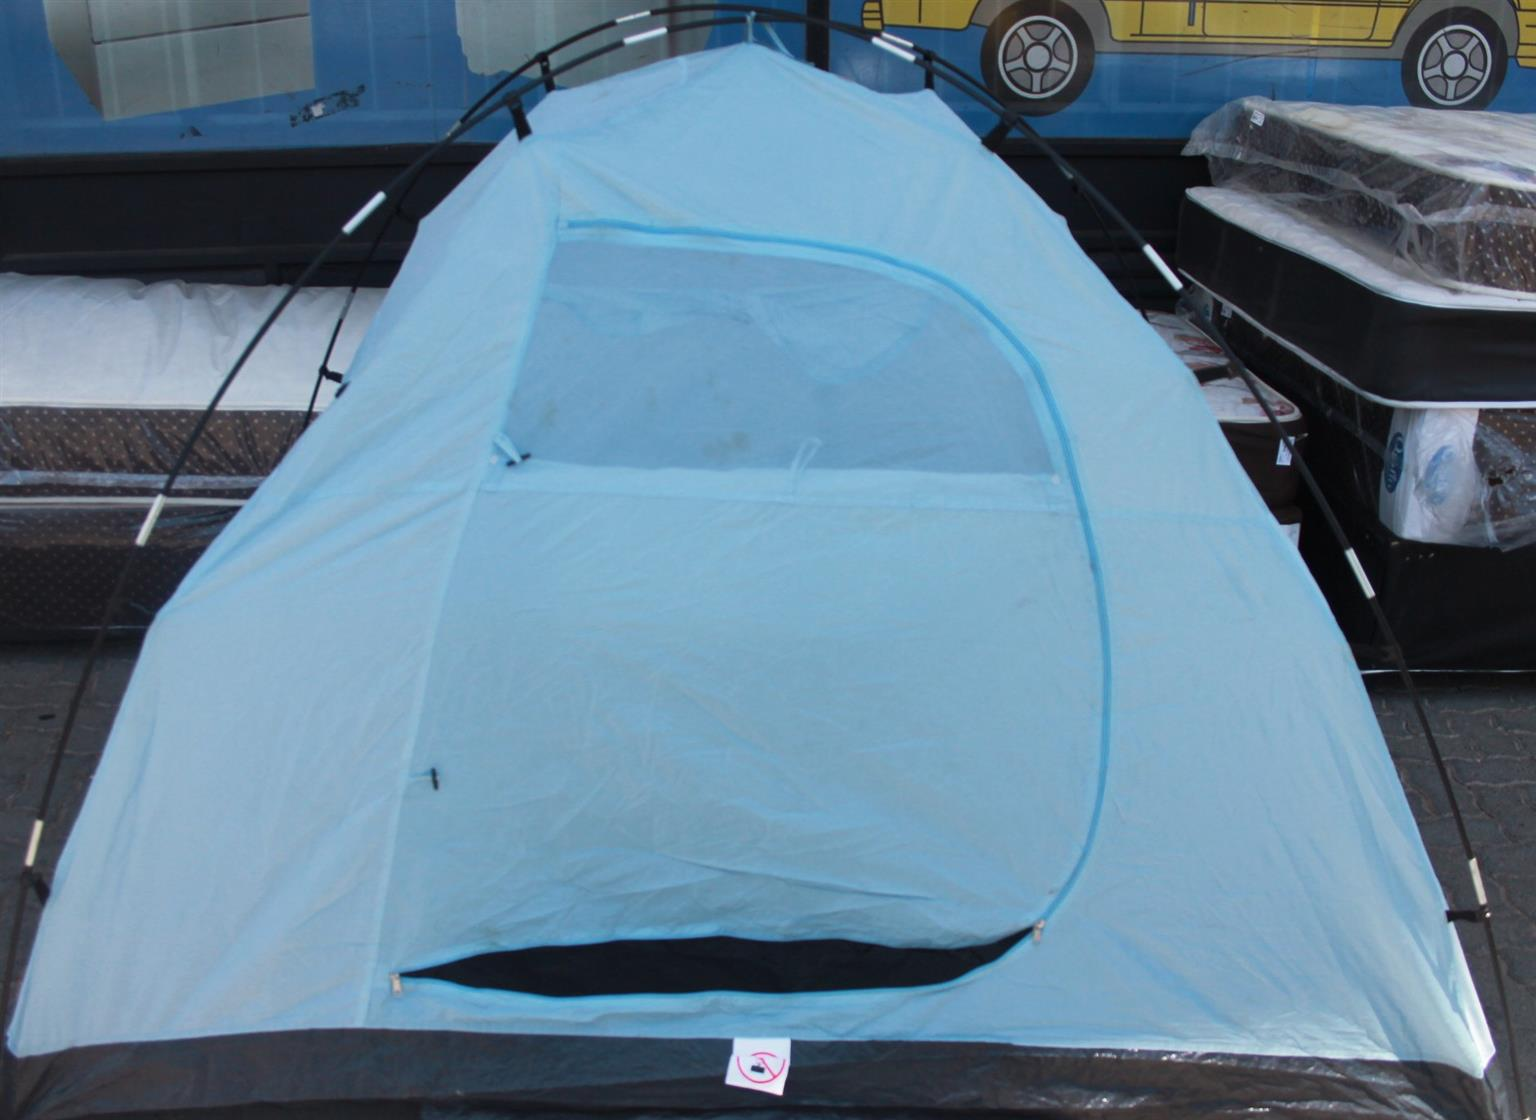 Coleman classic tent S026793a #Rosettenvillepawnshop